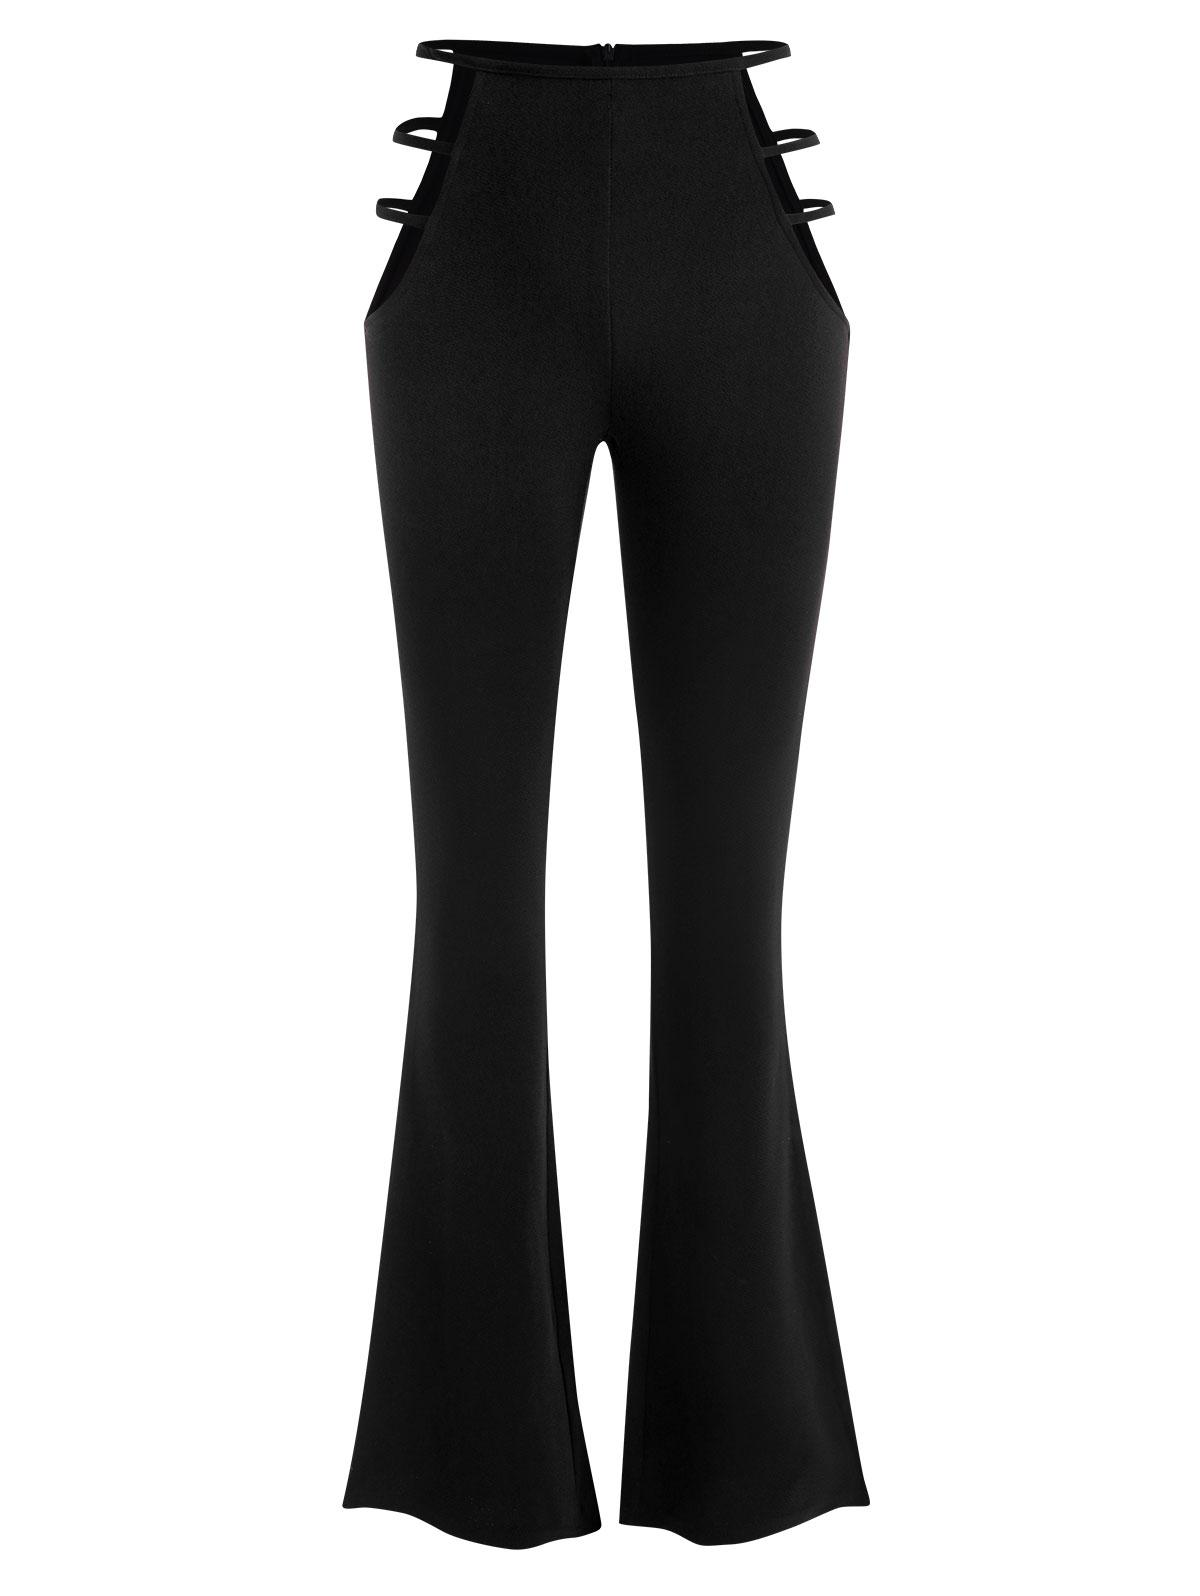 PantalonBootcutDécoupé Texturé à Taille Haute Xl - Zaful FR - Modalova